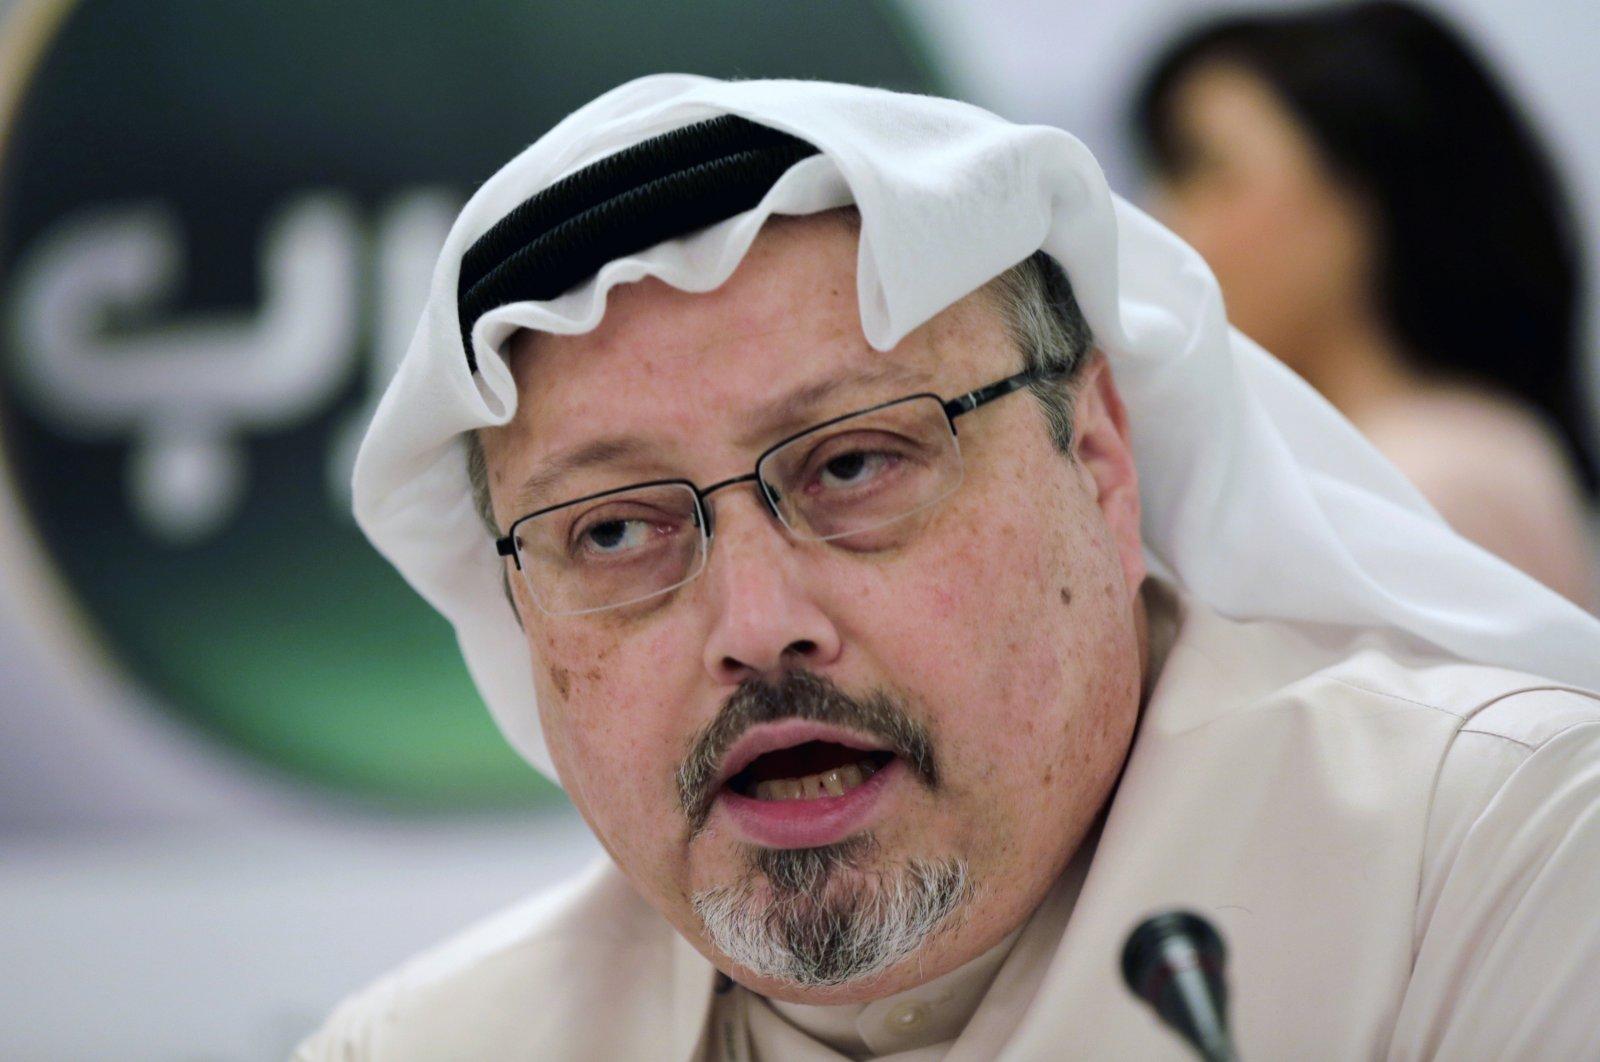 In this Dec. 15, 2014, file photo, Saudi journalist Jamal Khashoggi speaks during a press conference in Manama, Bahrain. (AP Photo)